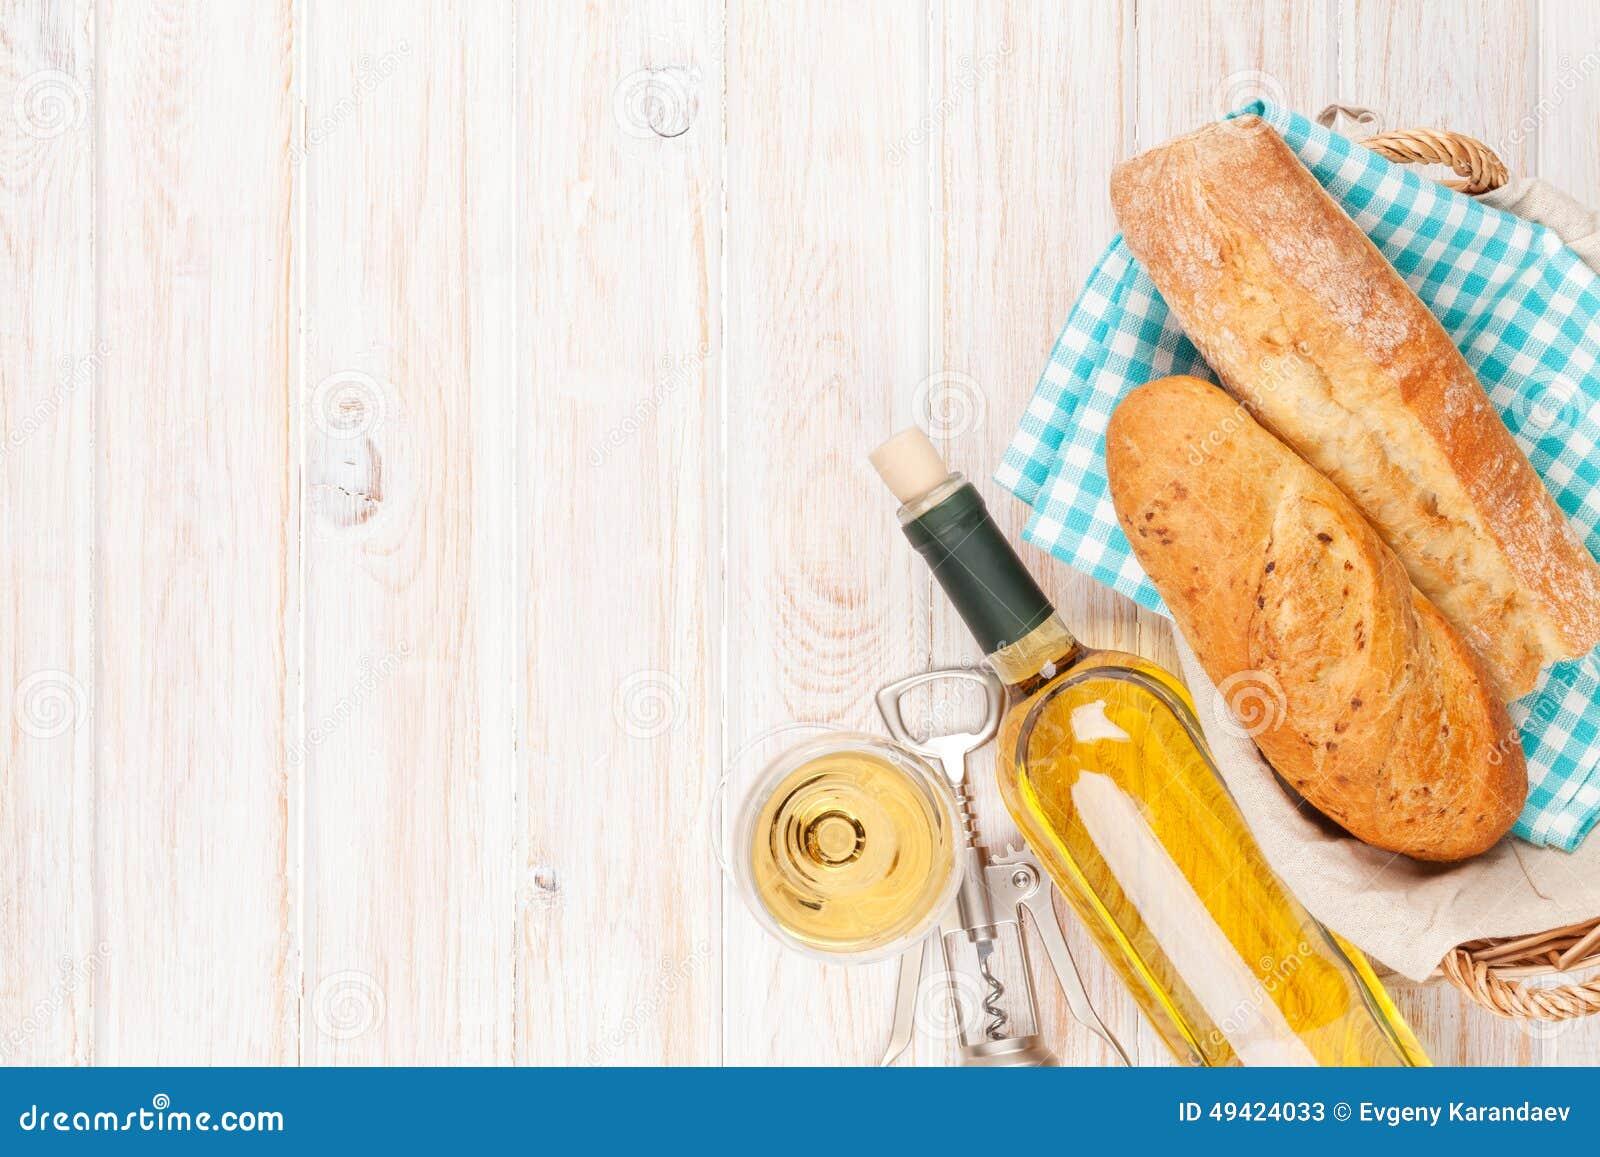 Vino blanco, pan y barril